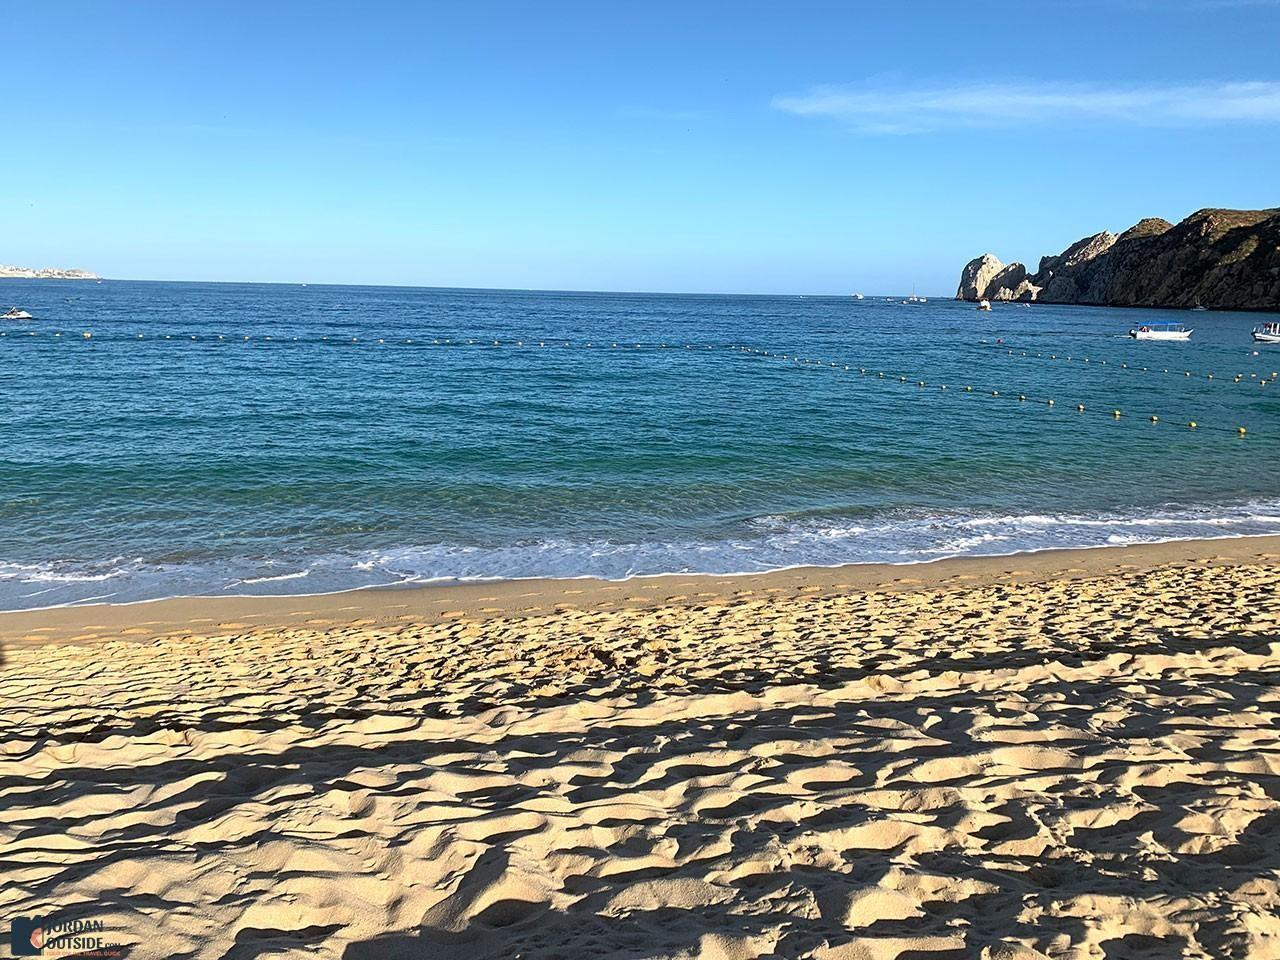 Beach at the boardwalk of Marina Fiesta